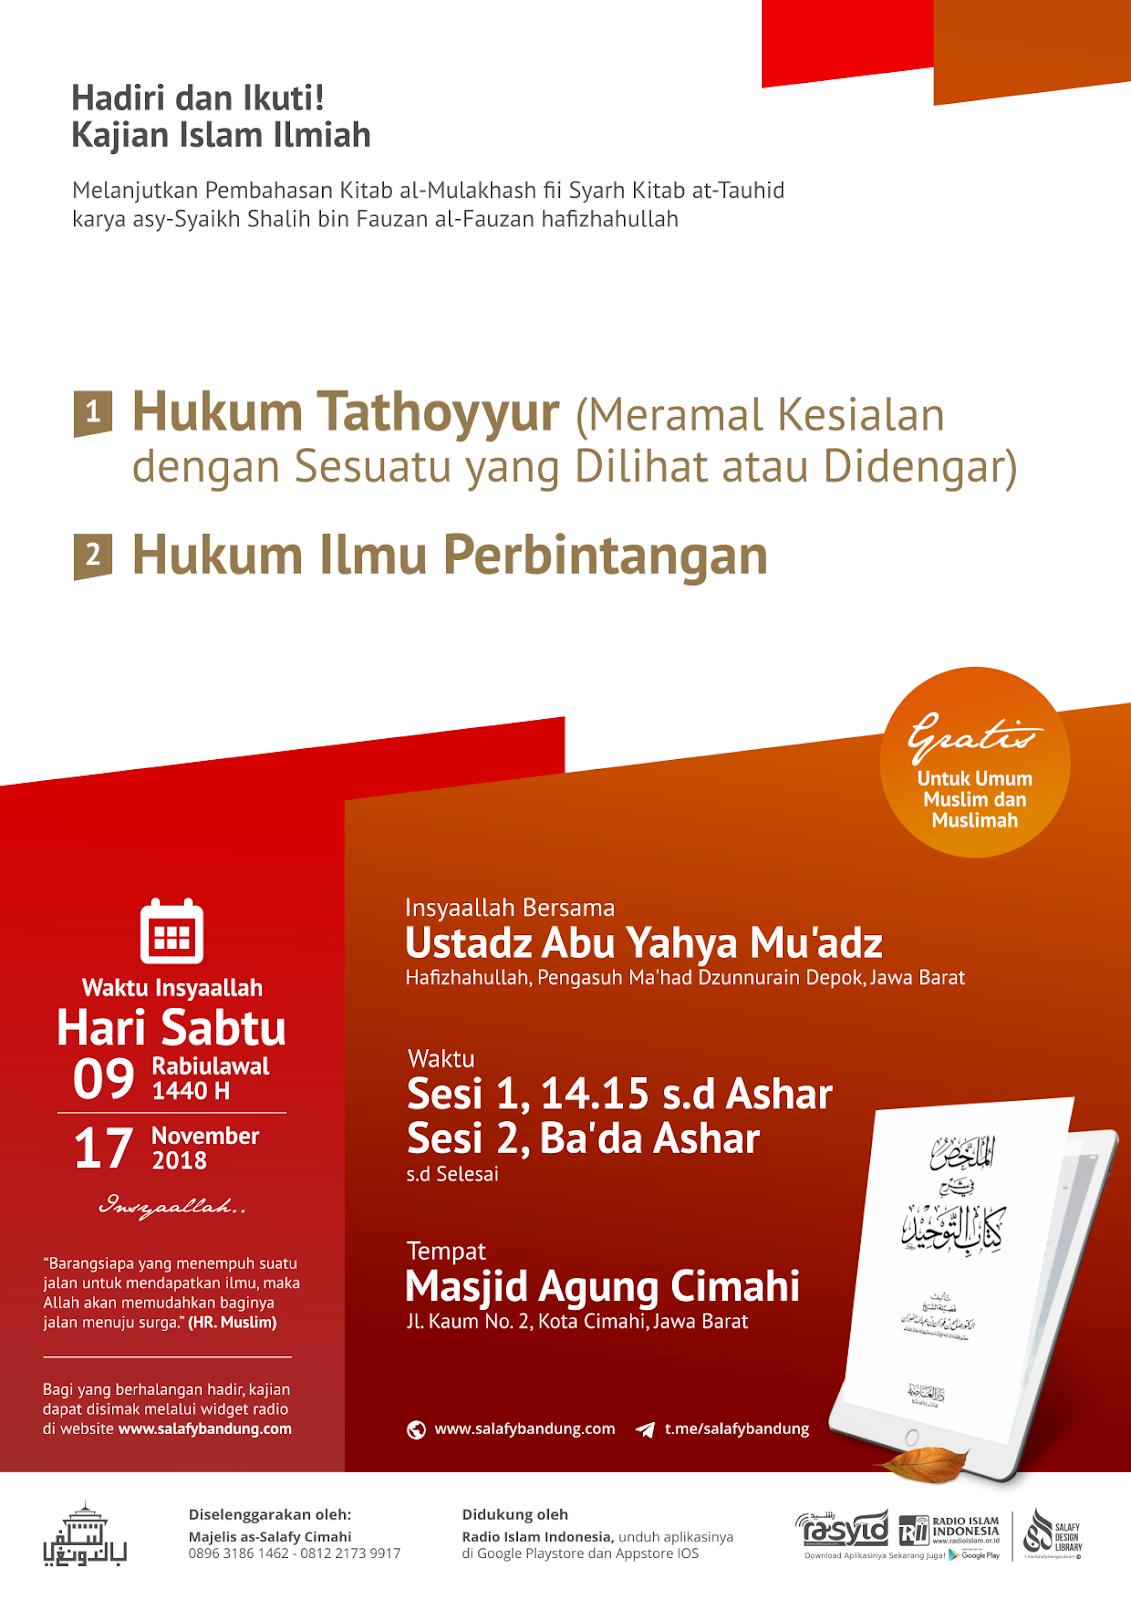 Audio Kajian Kitab Al Mulakhash fii Syarhi Kitab at Tauhid: Bab Hukum Tathayyur dan Ilmu Perbintangan